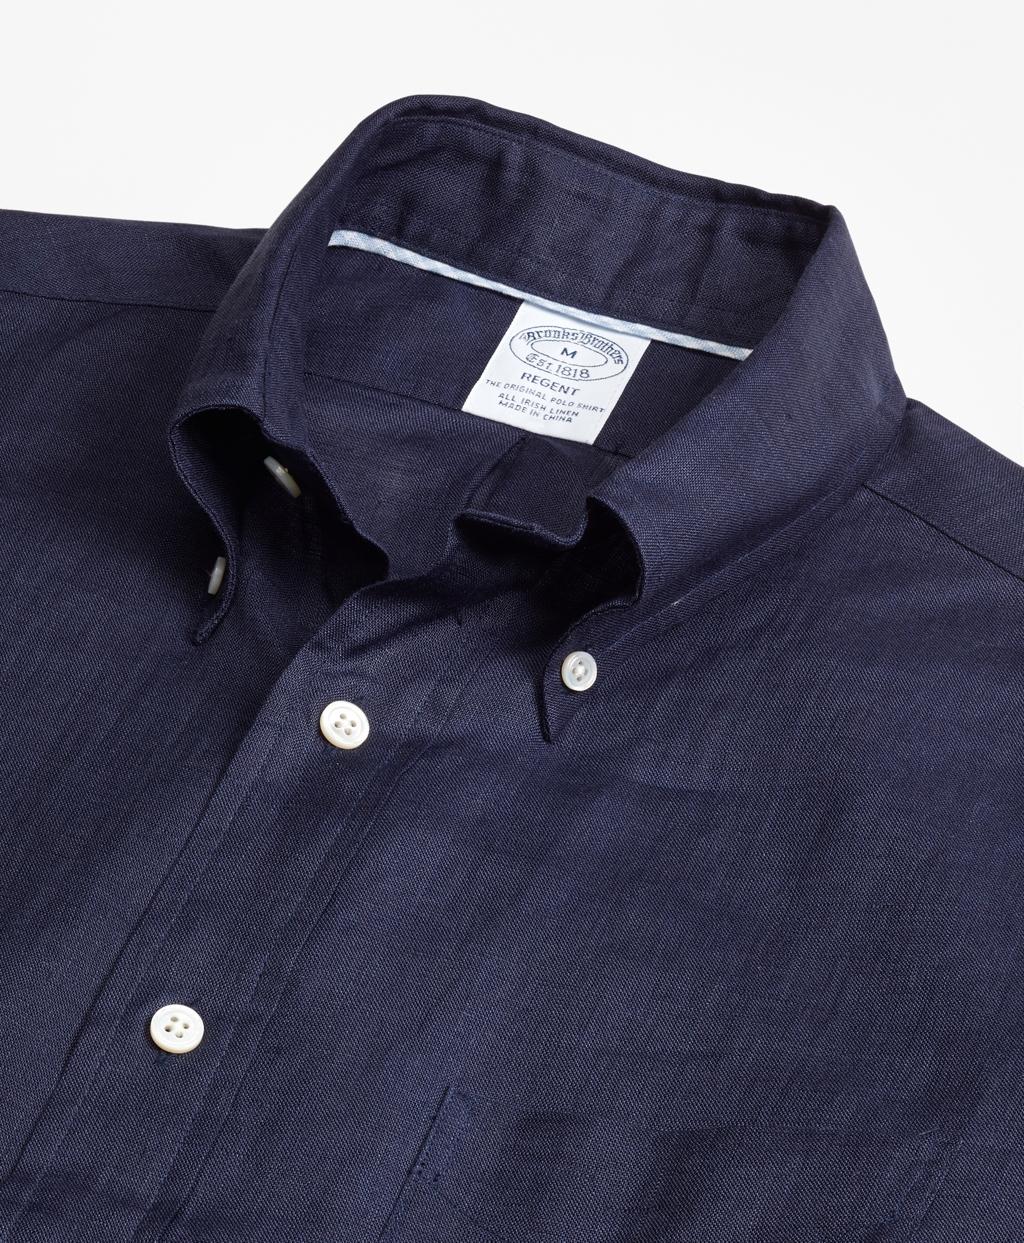 77f5dc12aa0 Brooks Brothers Sport Shirt Vs Dress Shirt – EDGE Engineering and ...